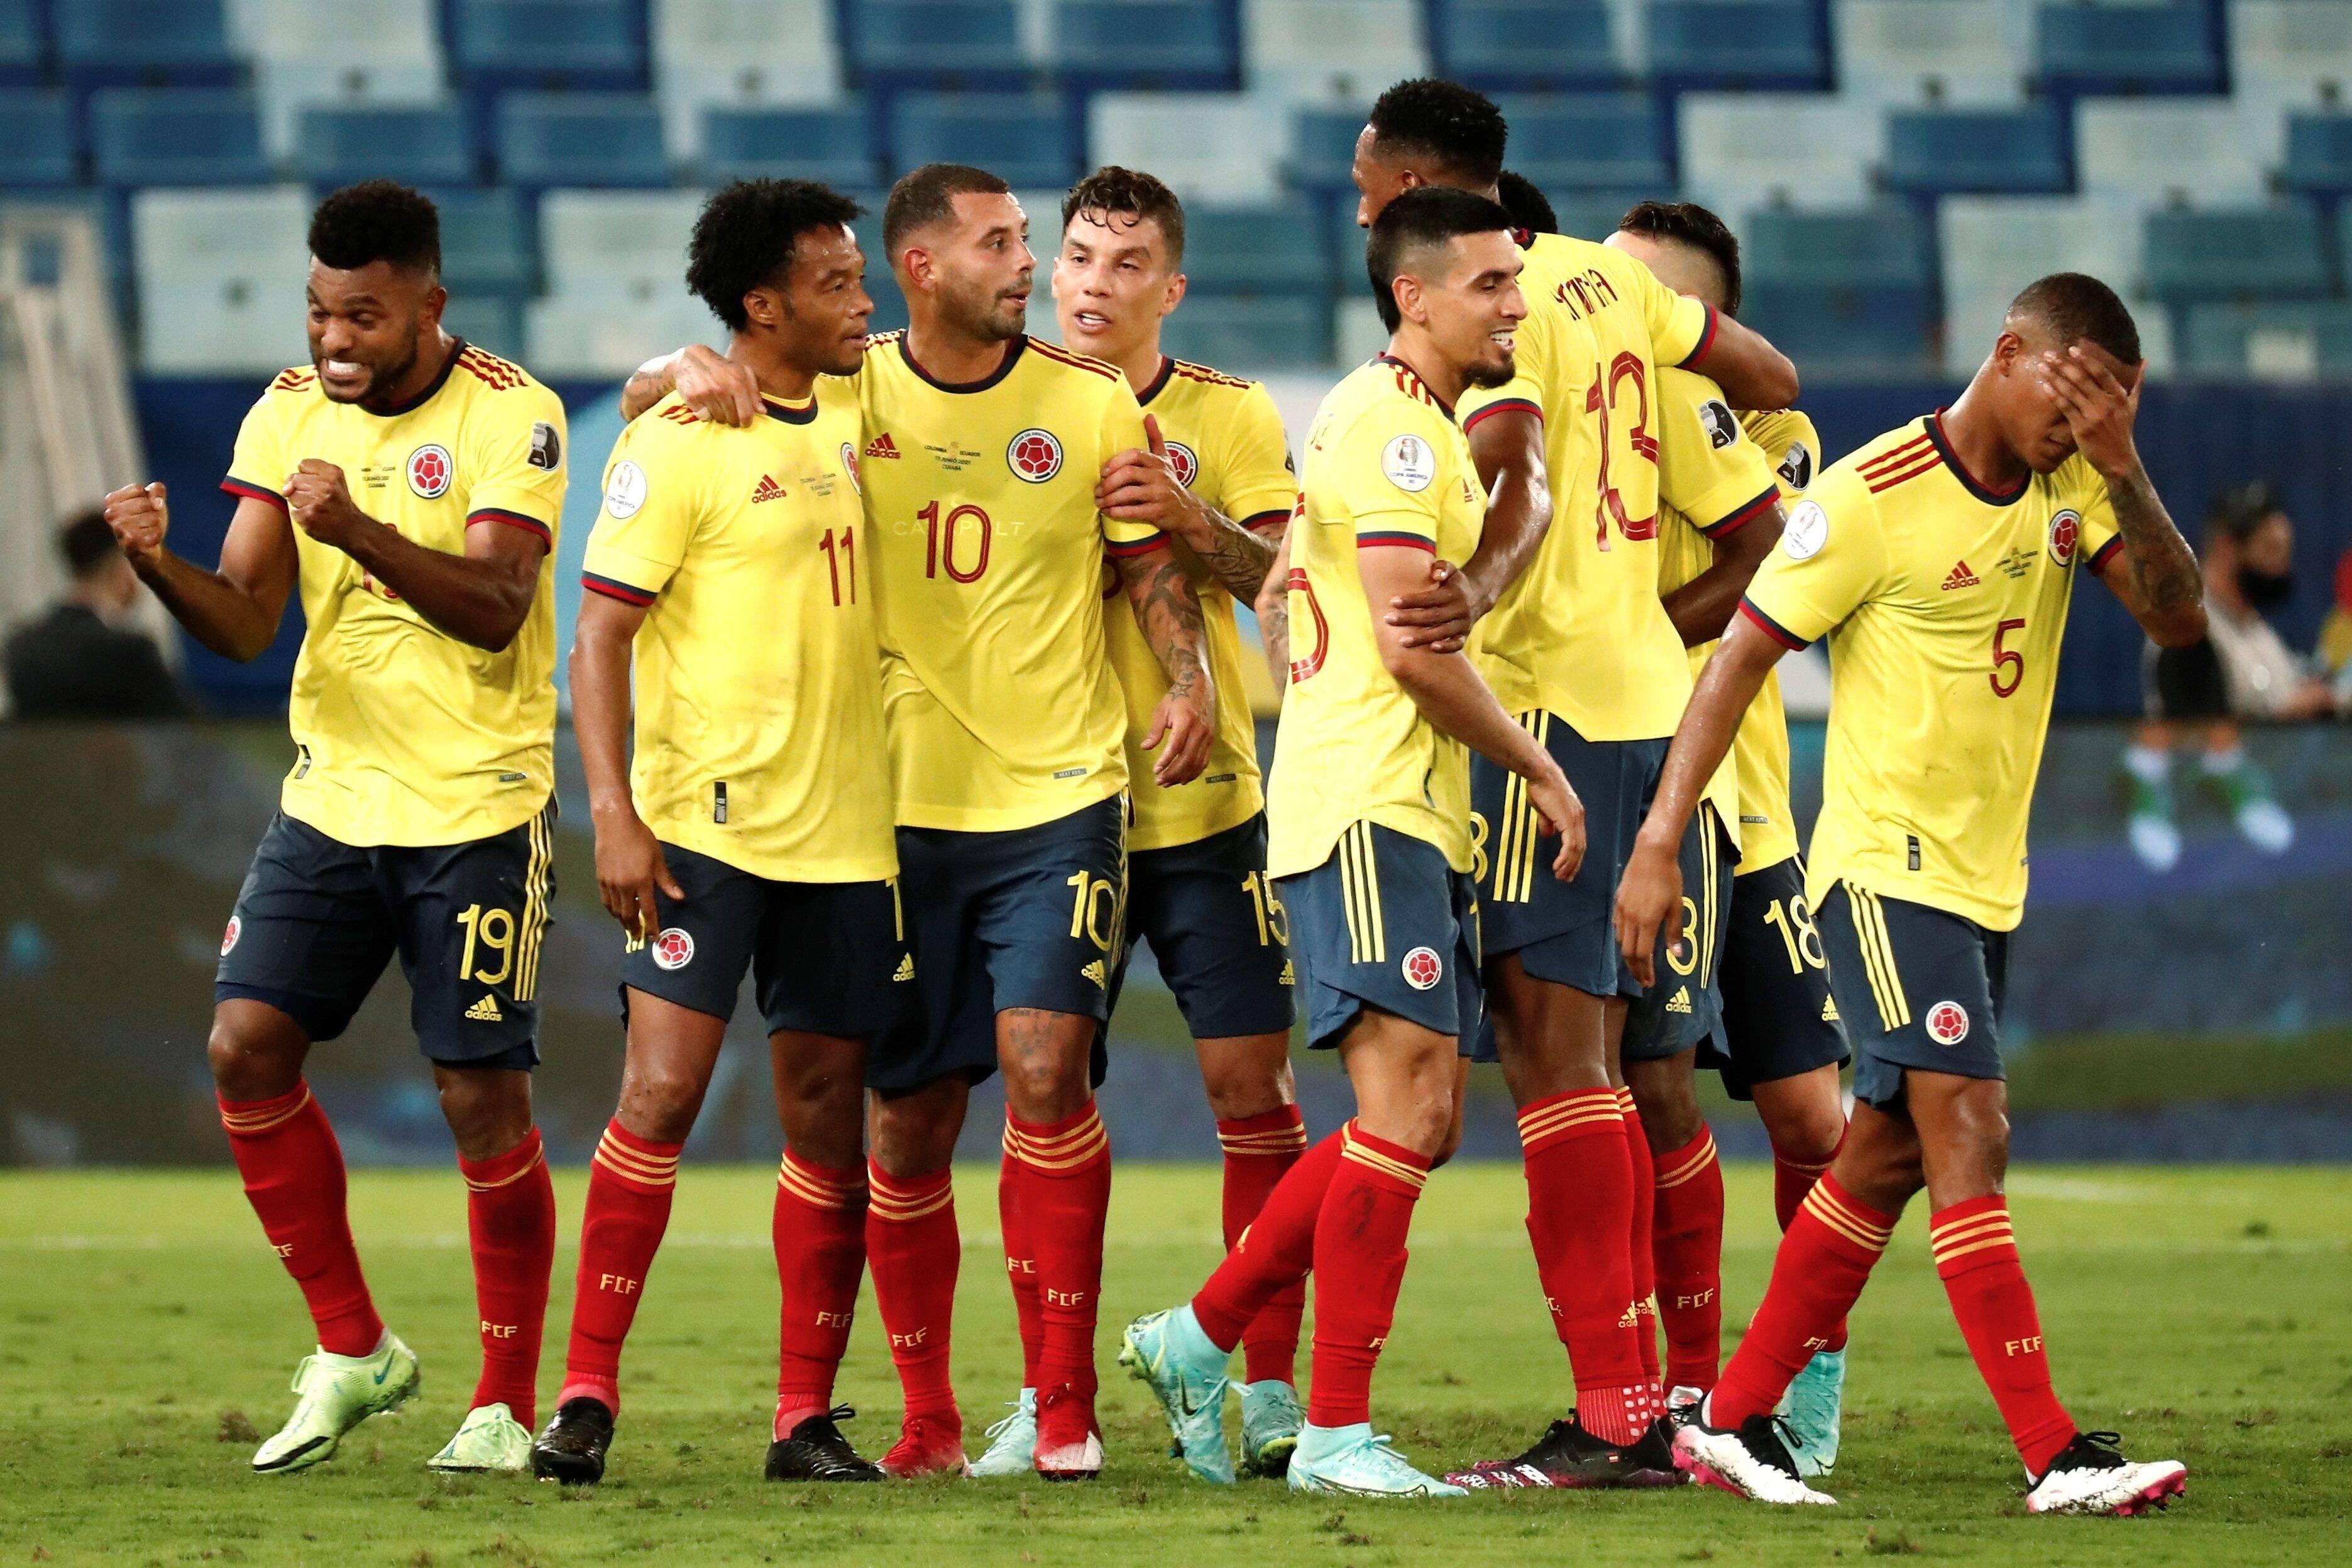 Juventus Juan Cuadrado opens up about Colombia's 1-0 victory over Ecuador to kick off Copa